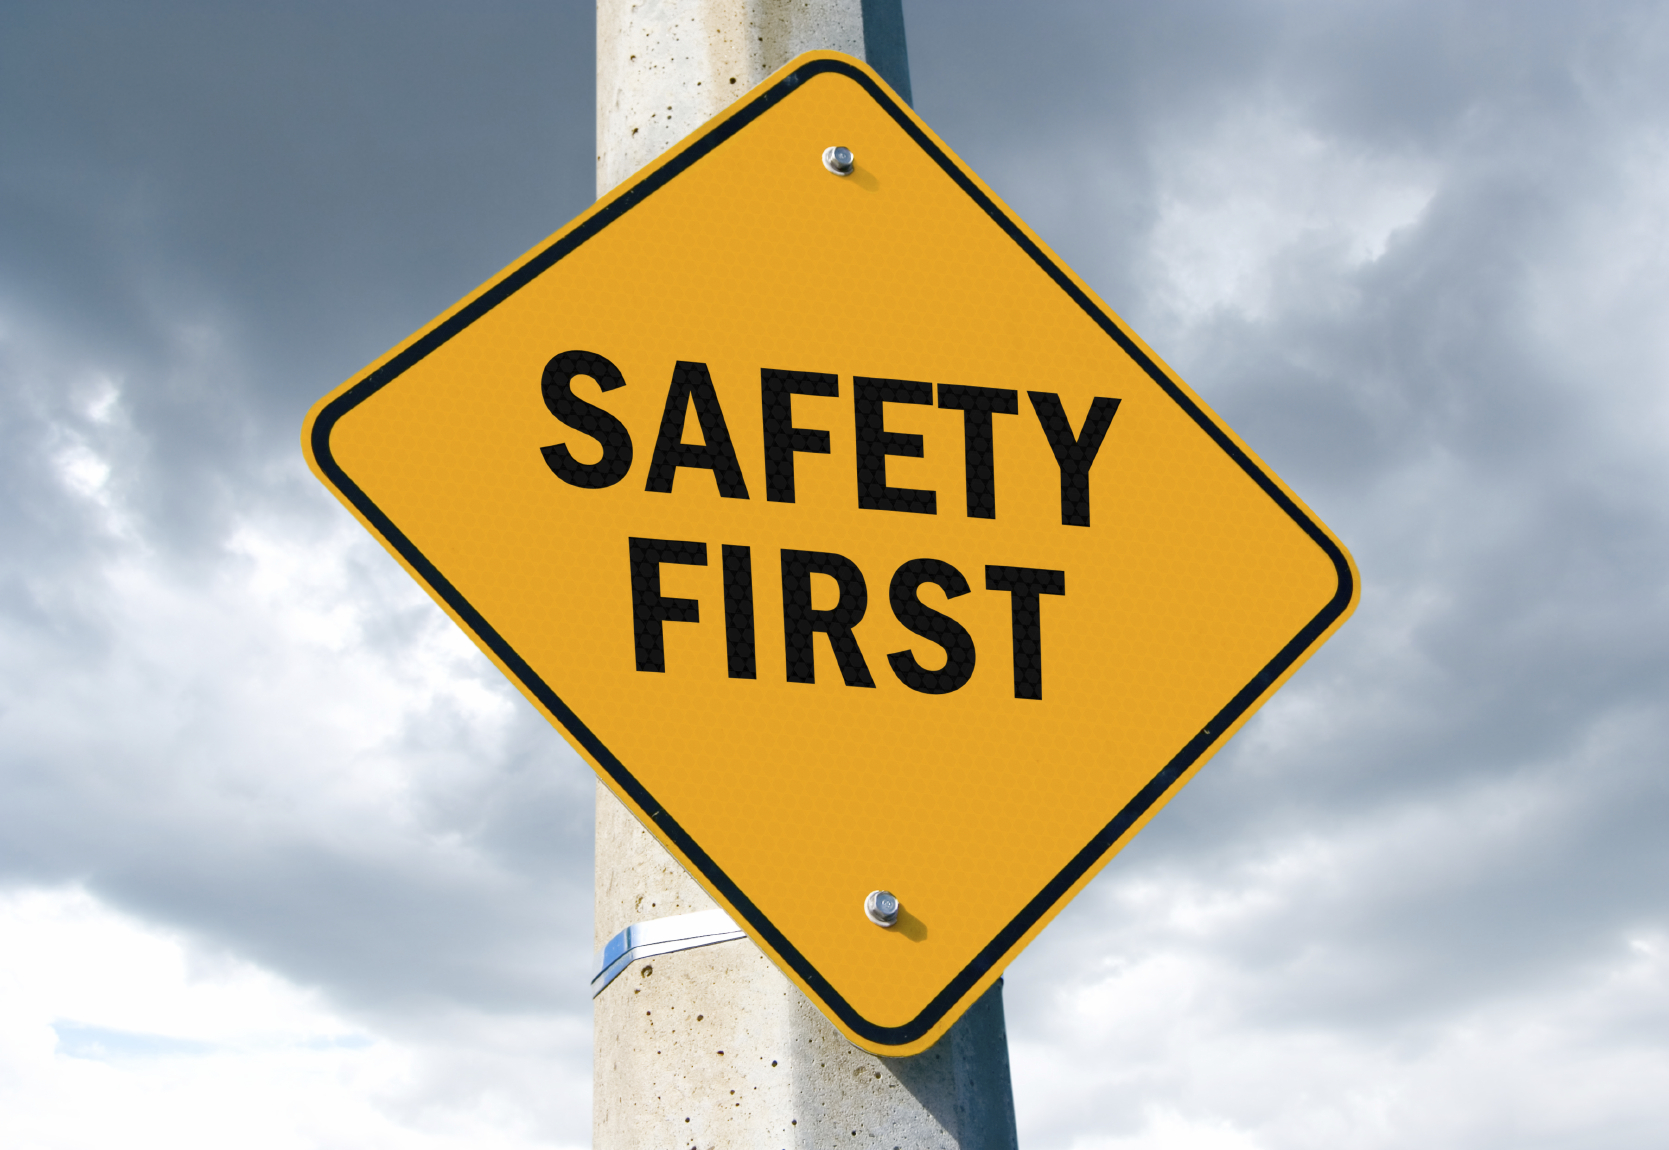 Boca Raton Tribune Launches Traffic Safety Awareness